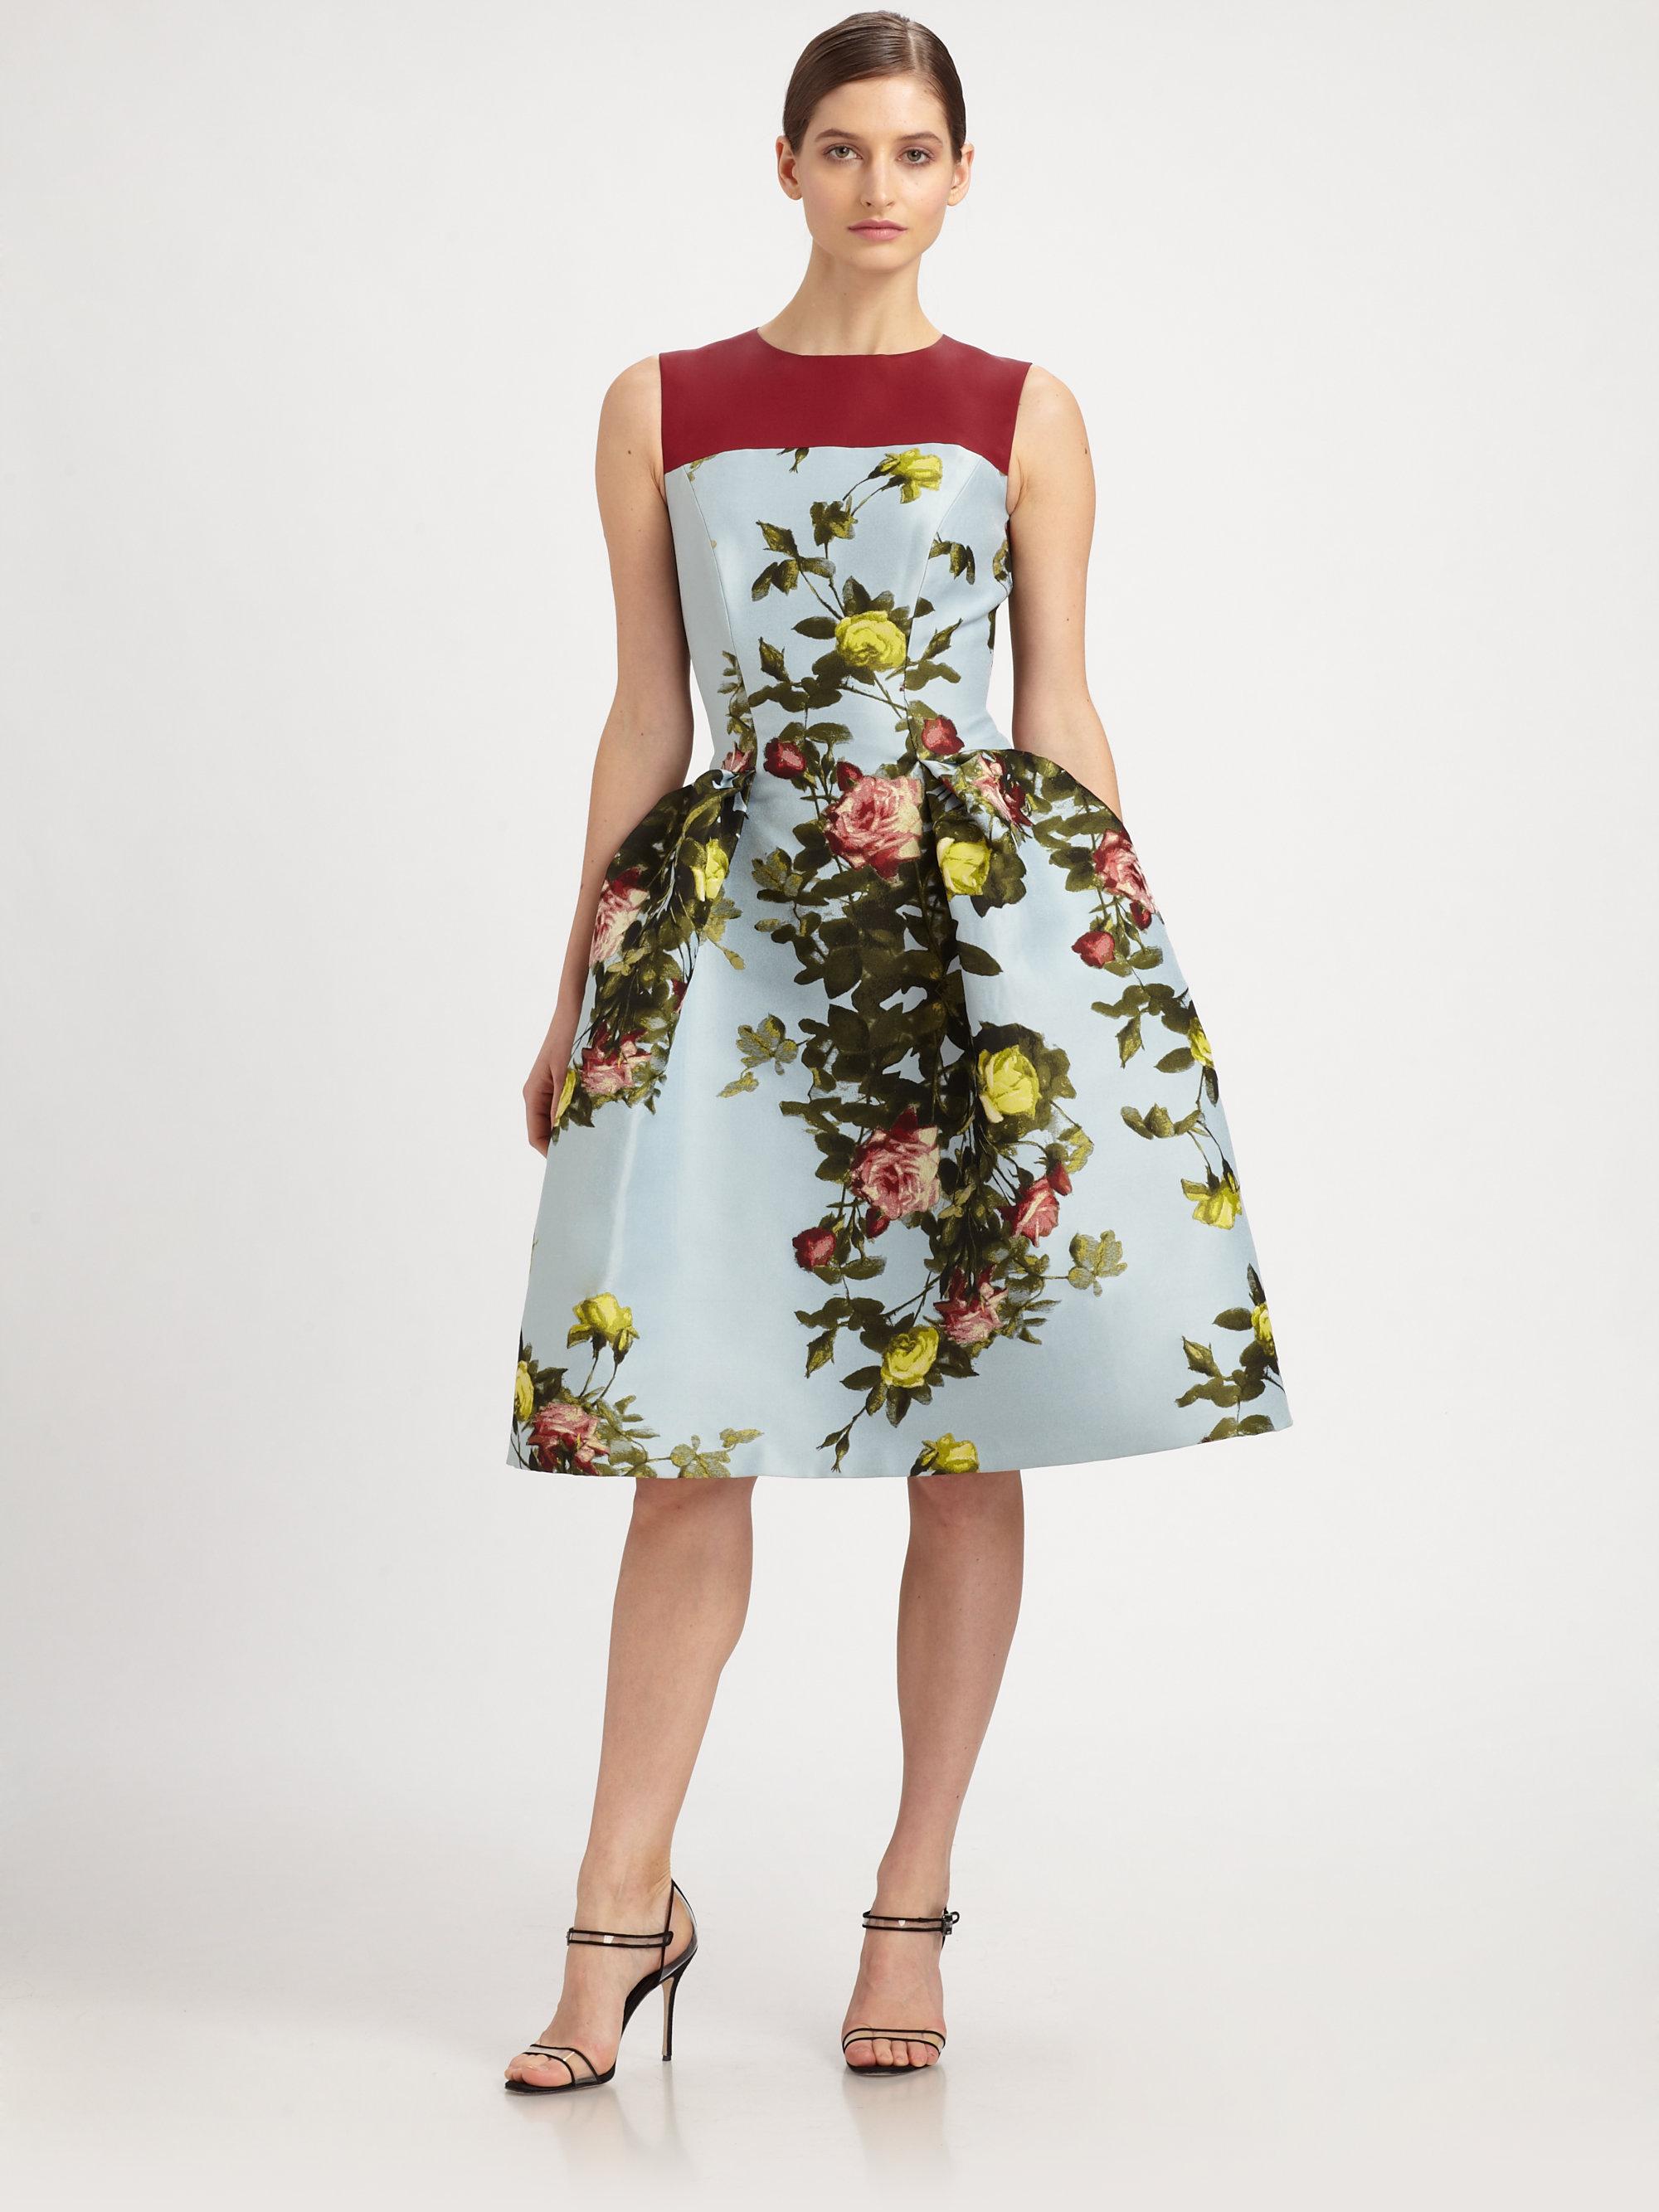 New St John Collection Loden Green Santana Knit 3PC Skirt Suit (12/M/12).